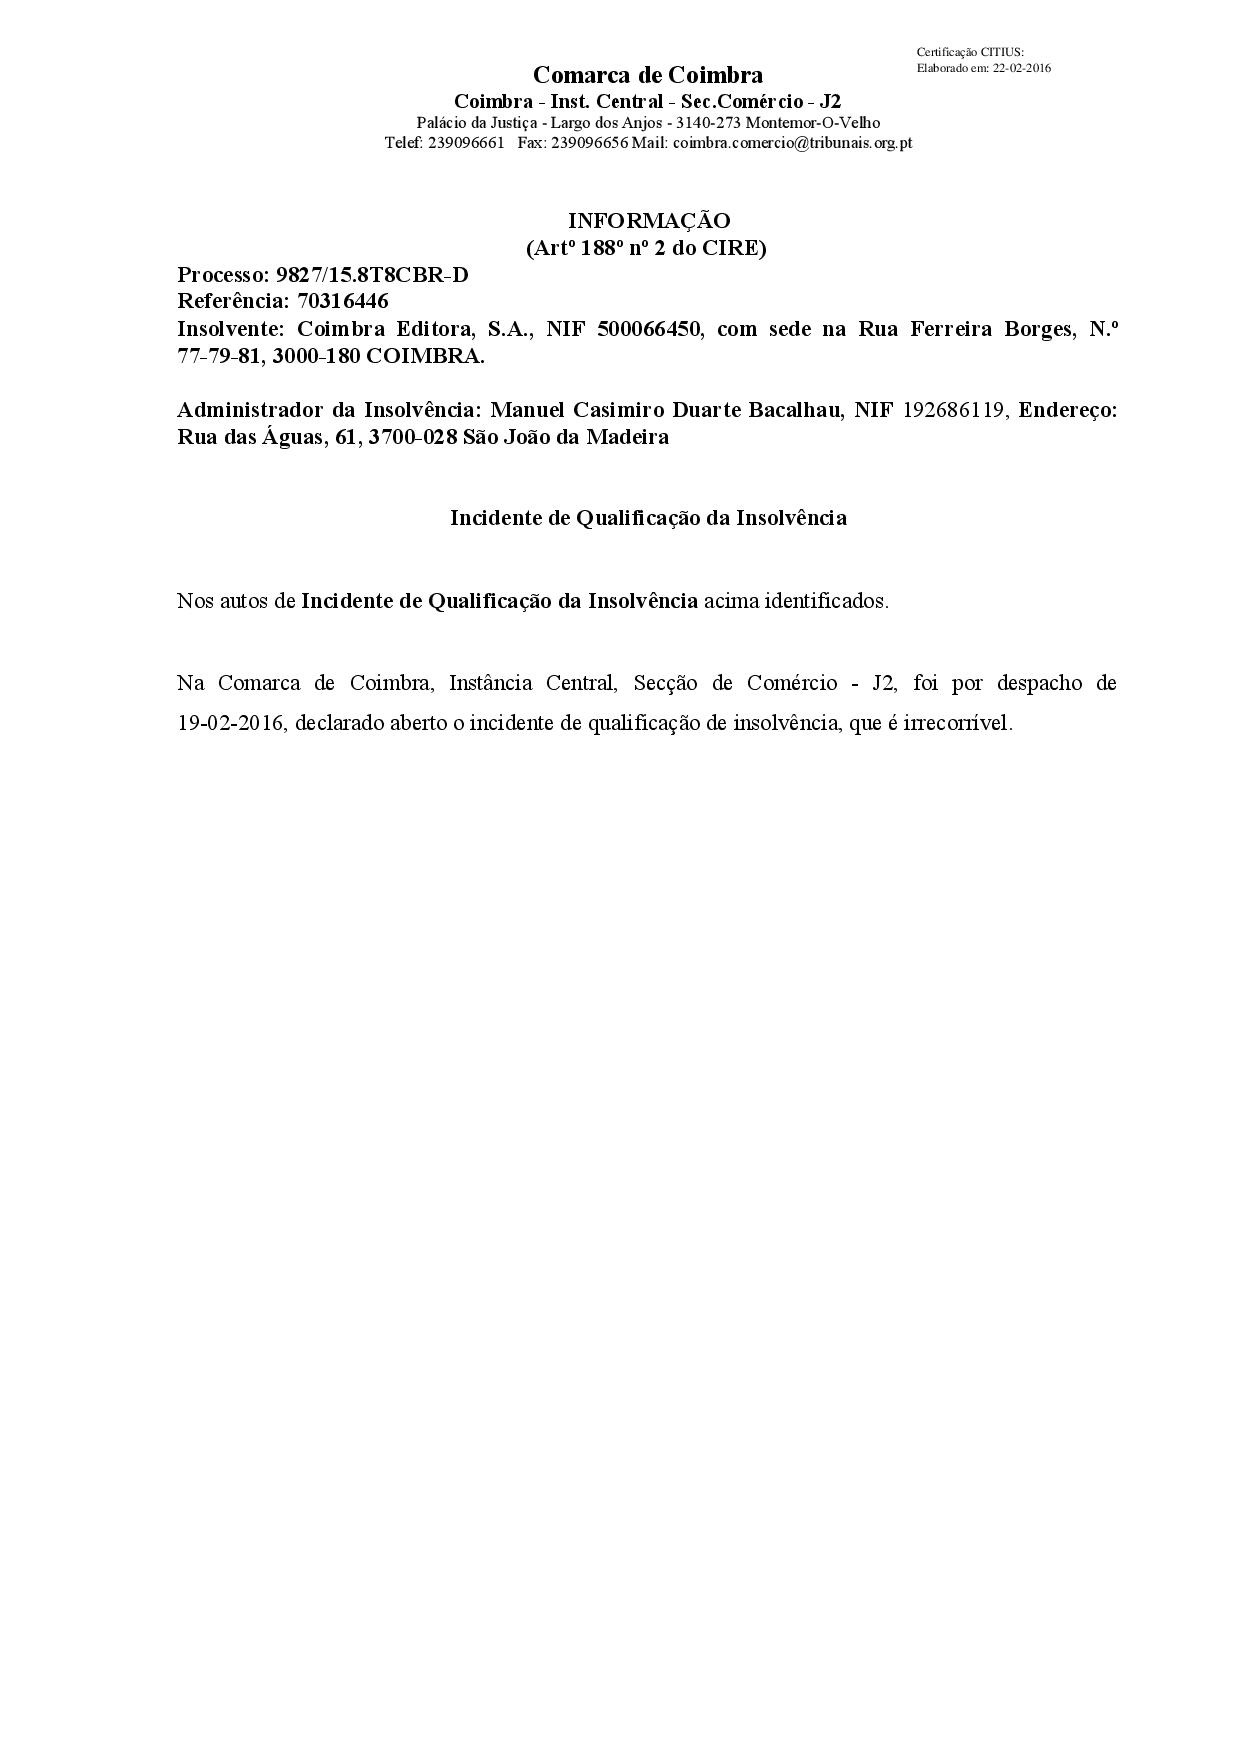 Edital (2)-page-001